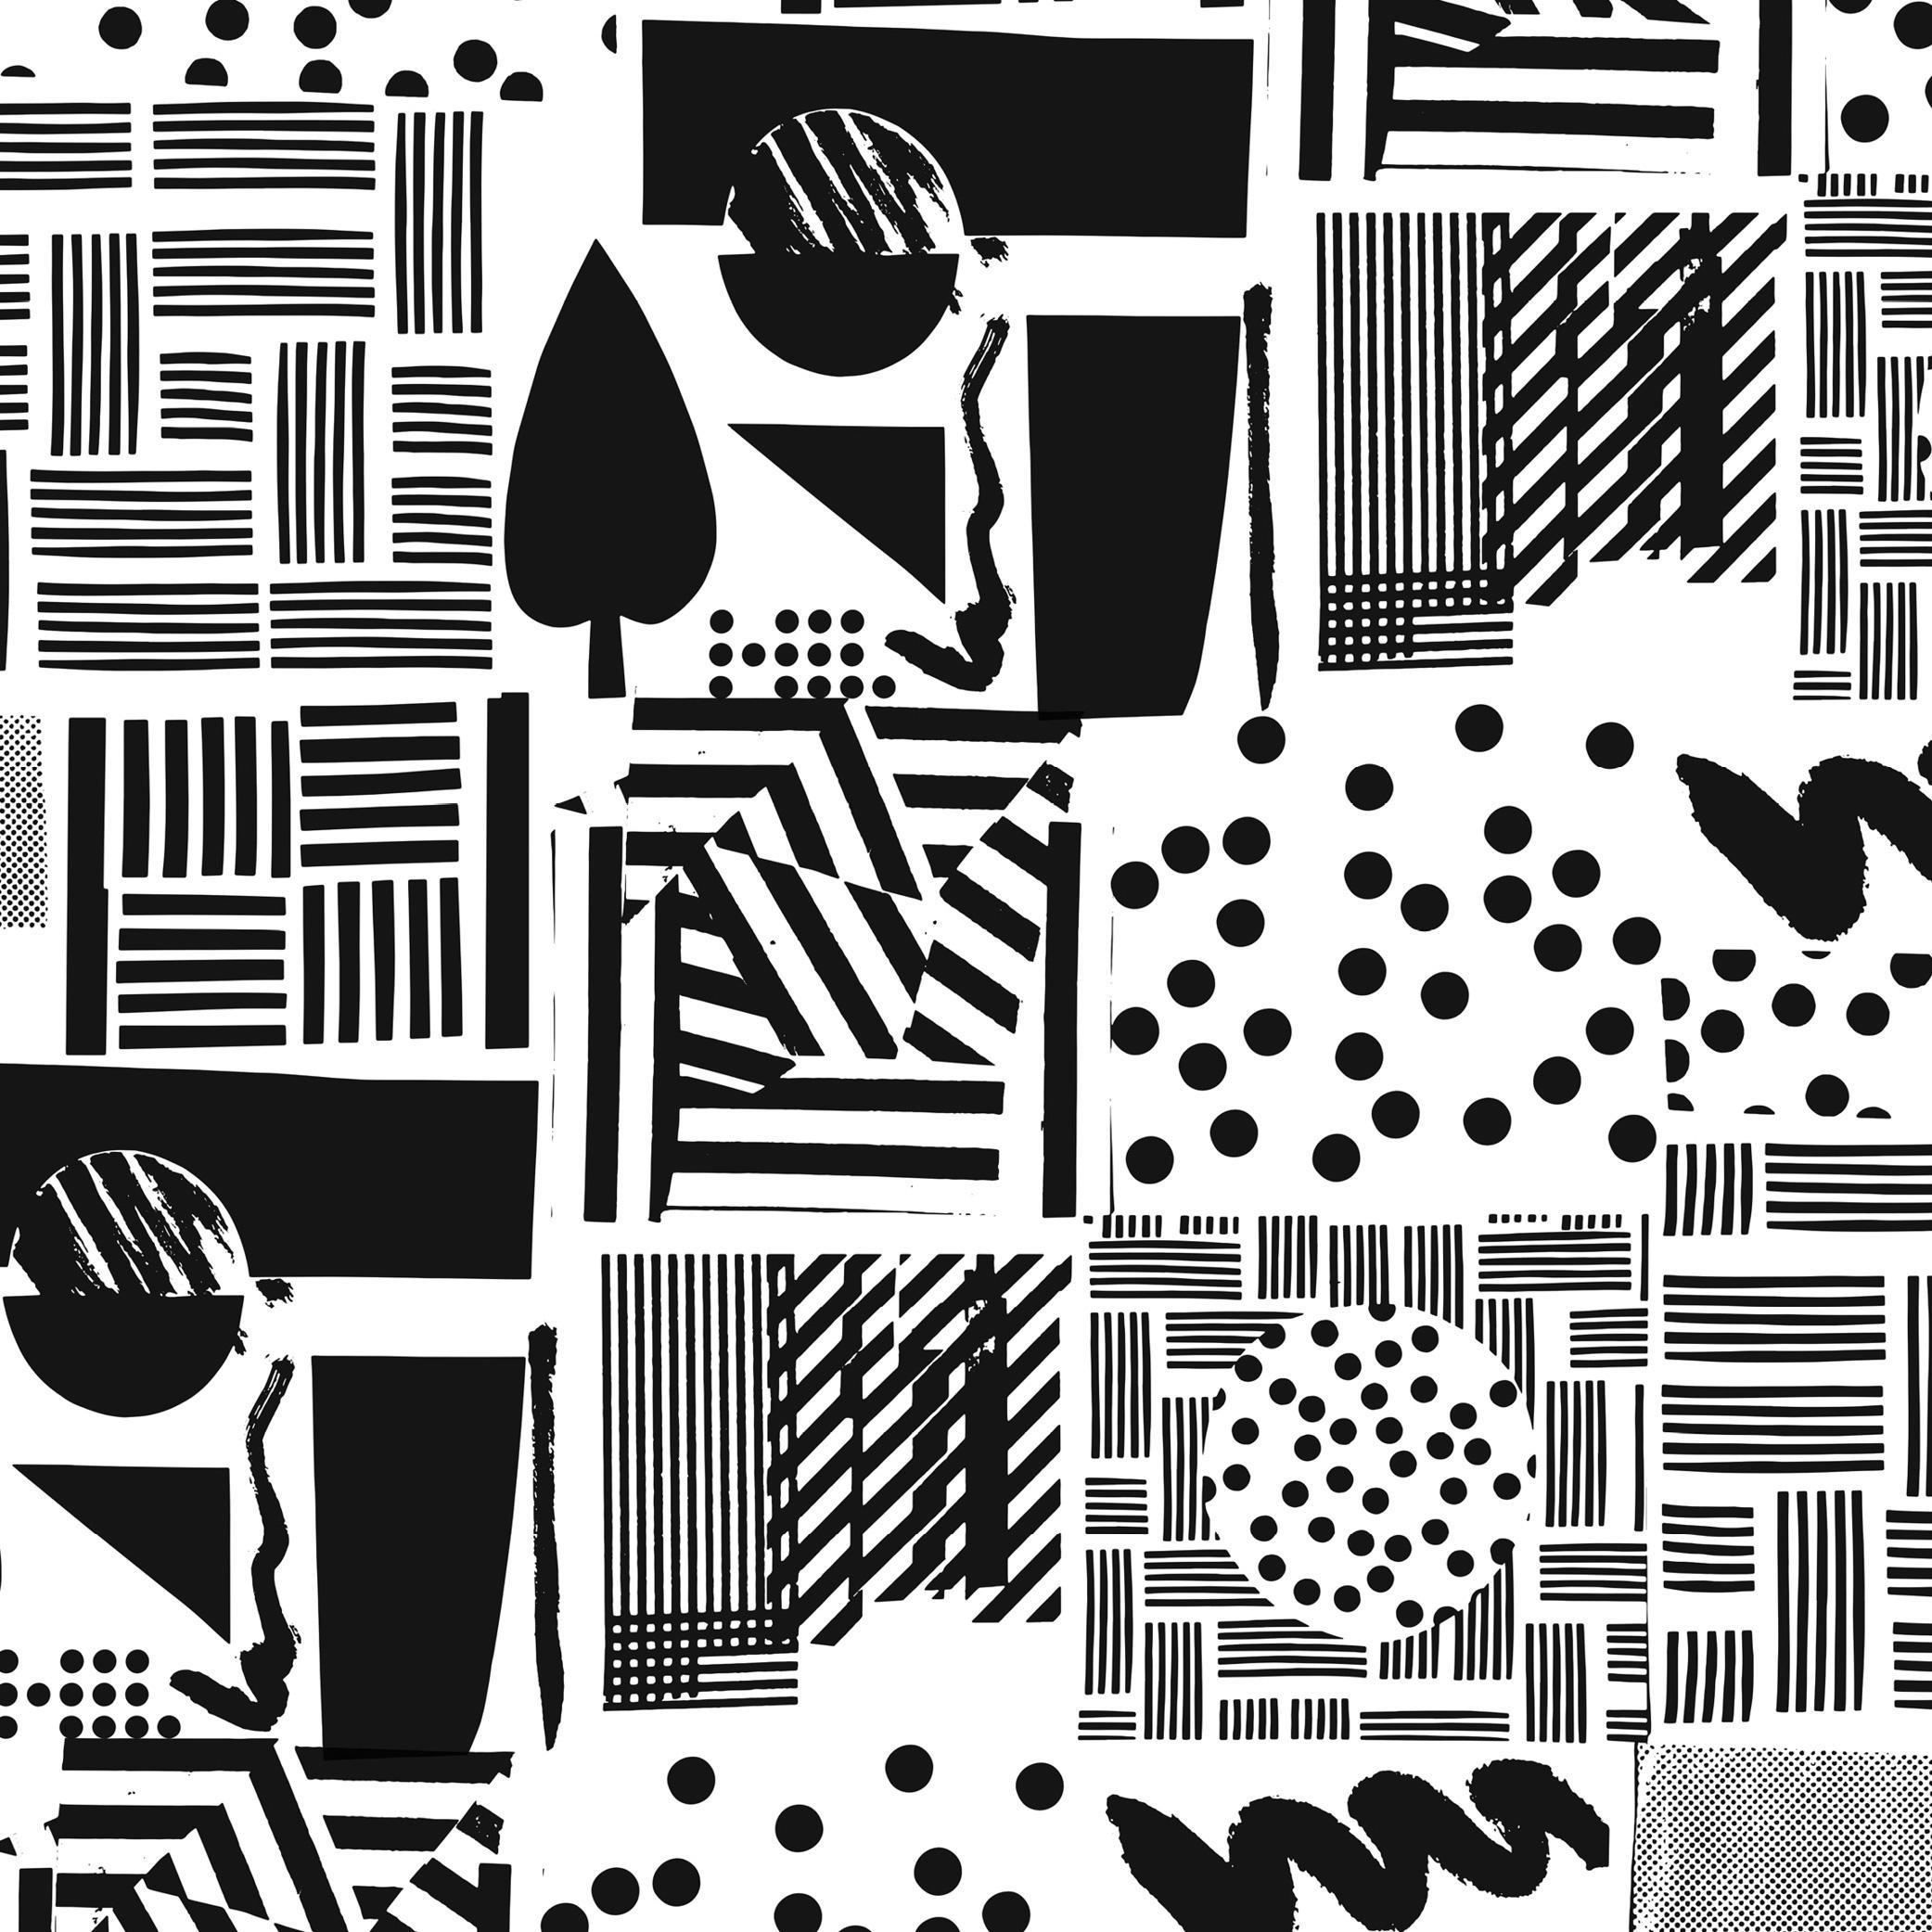 Marcus_Walters_InHouse_Pattern-Scribble_WEB.jpg